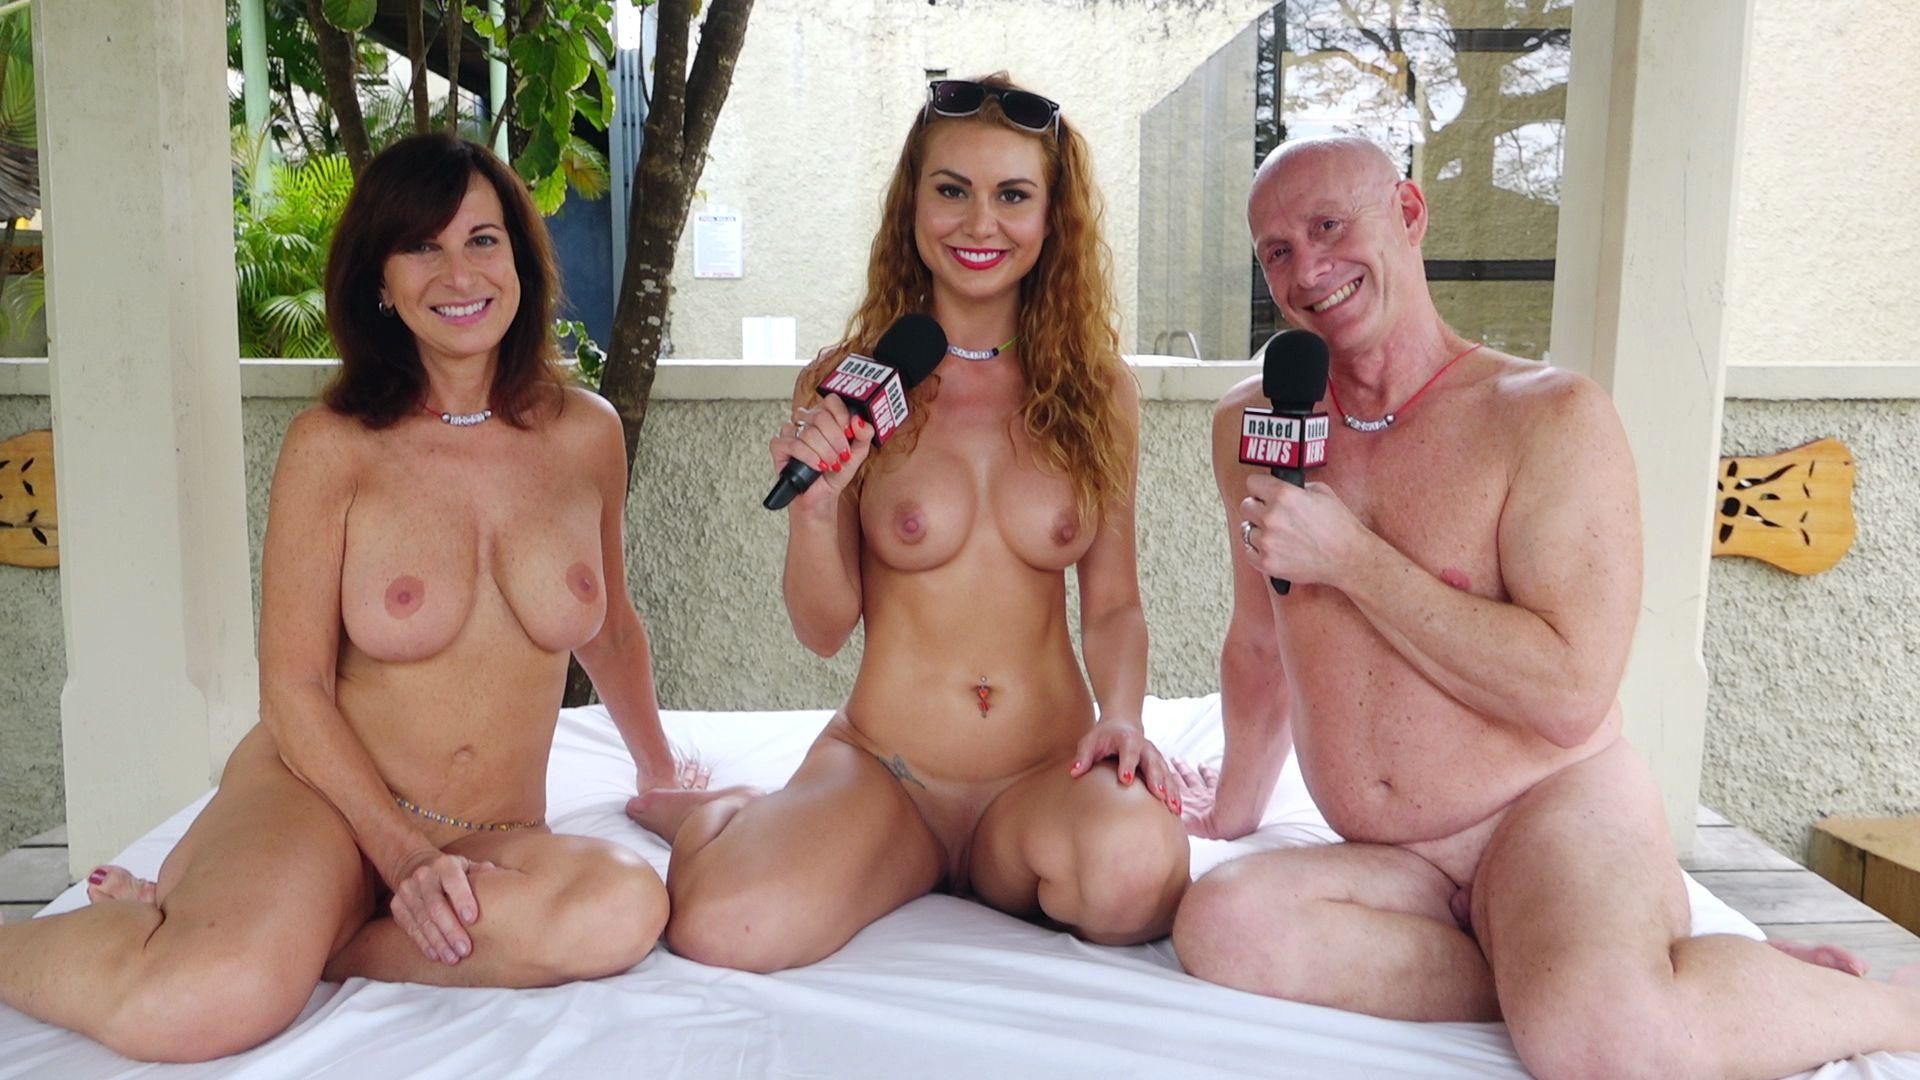 Jewel raiders free sex pics